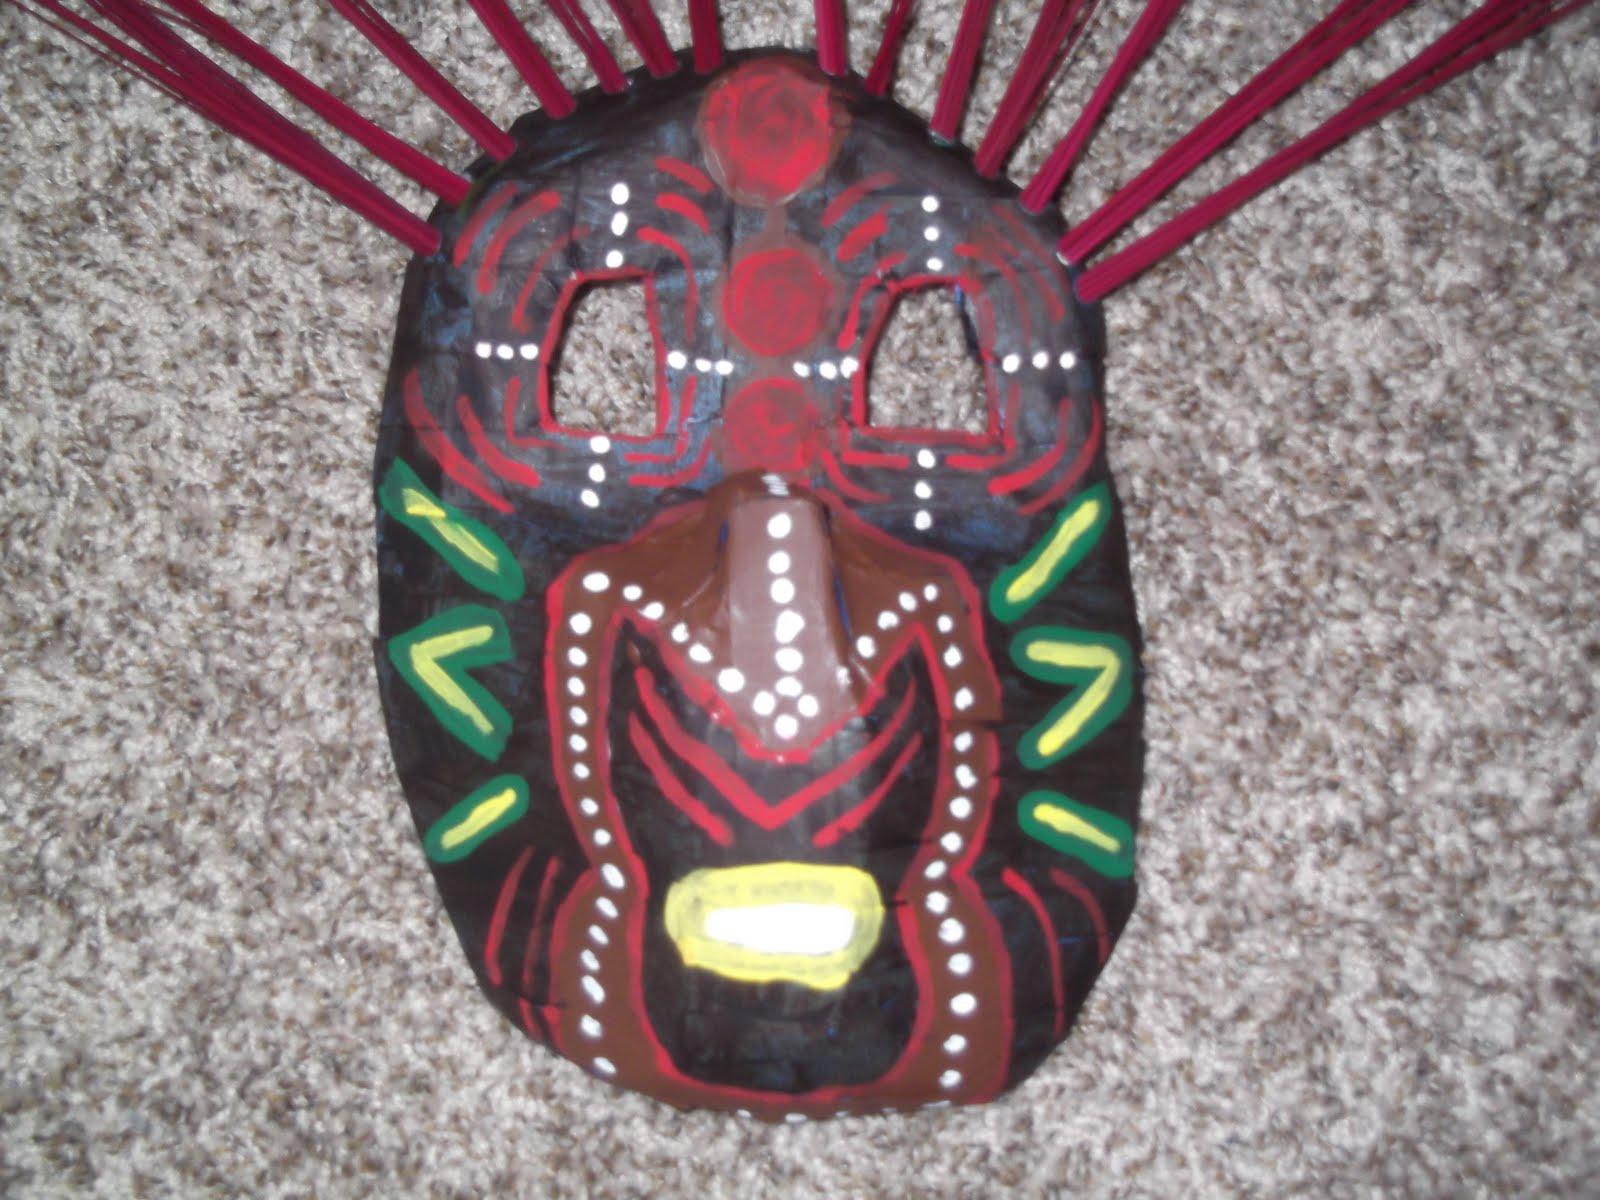 Laurel's Lovely Artwork for Art 3700: African Milk Jug Mask